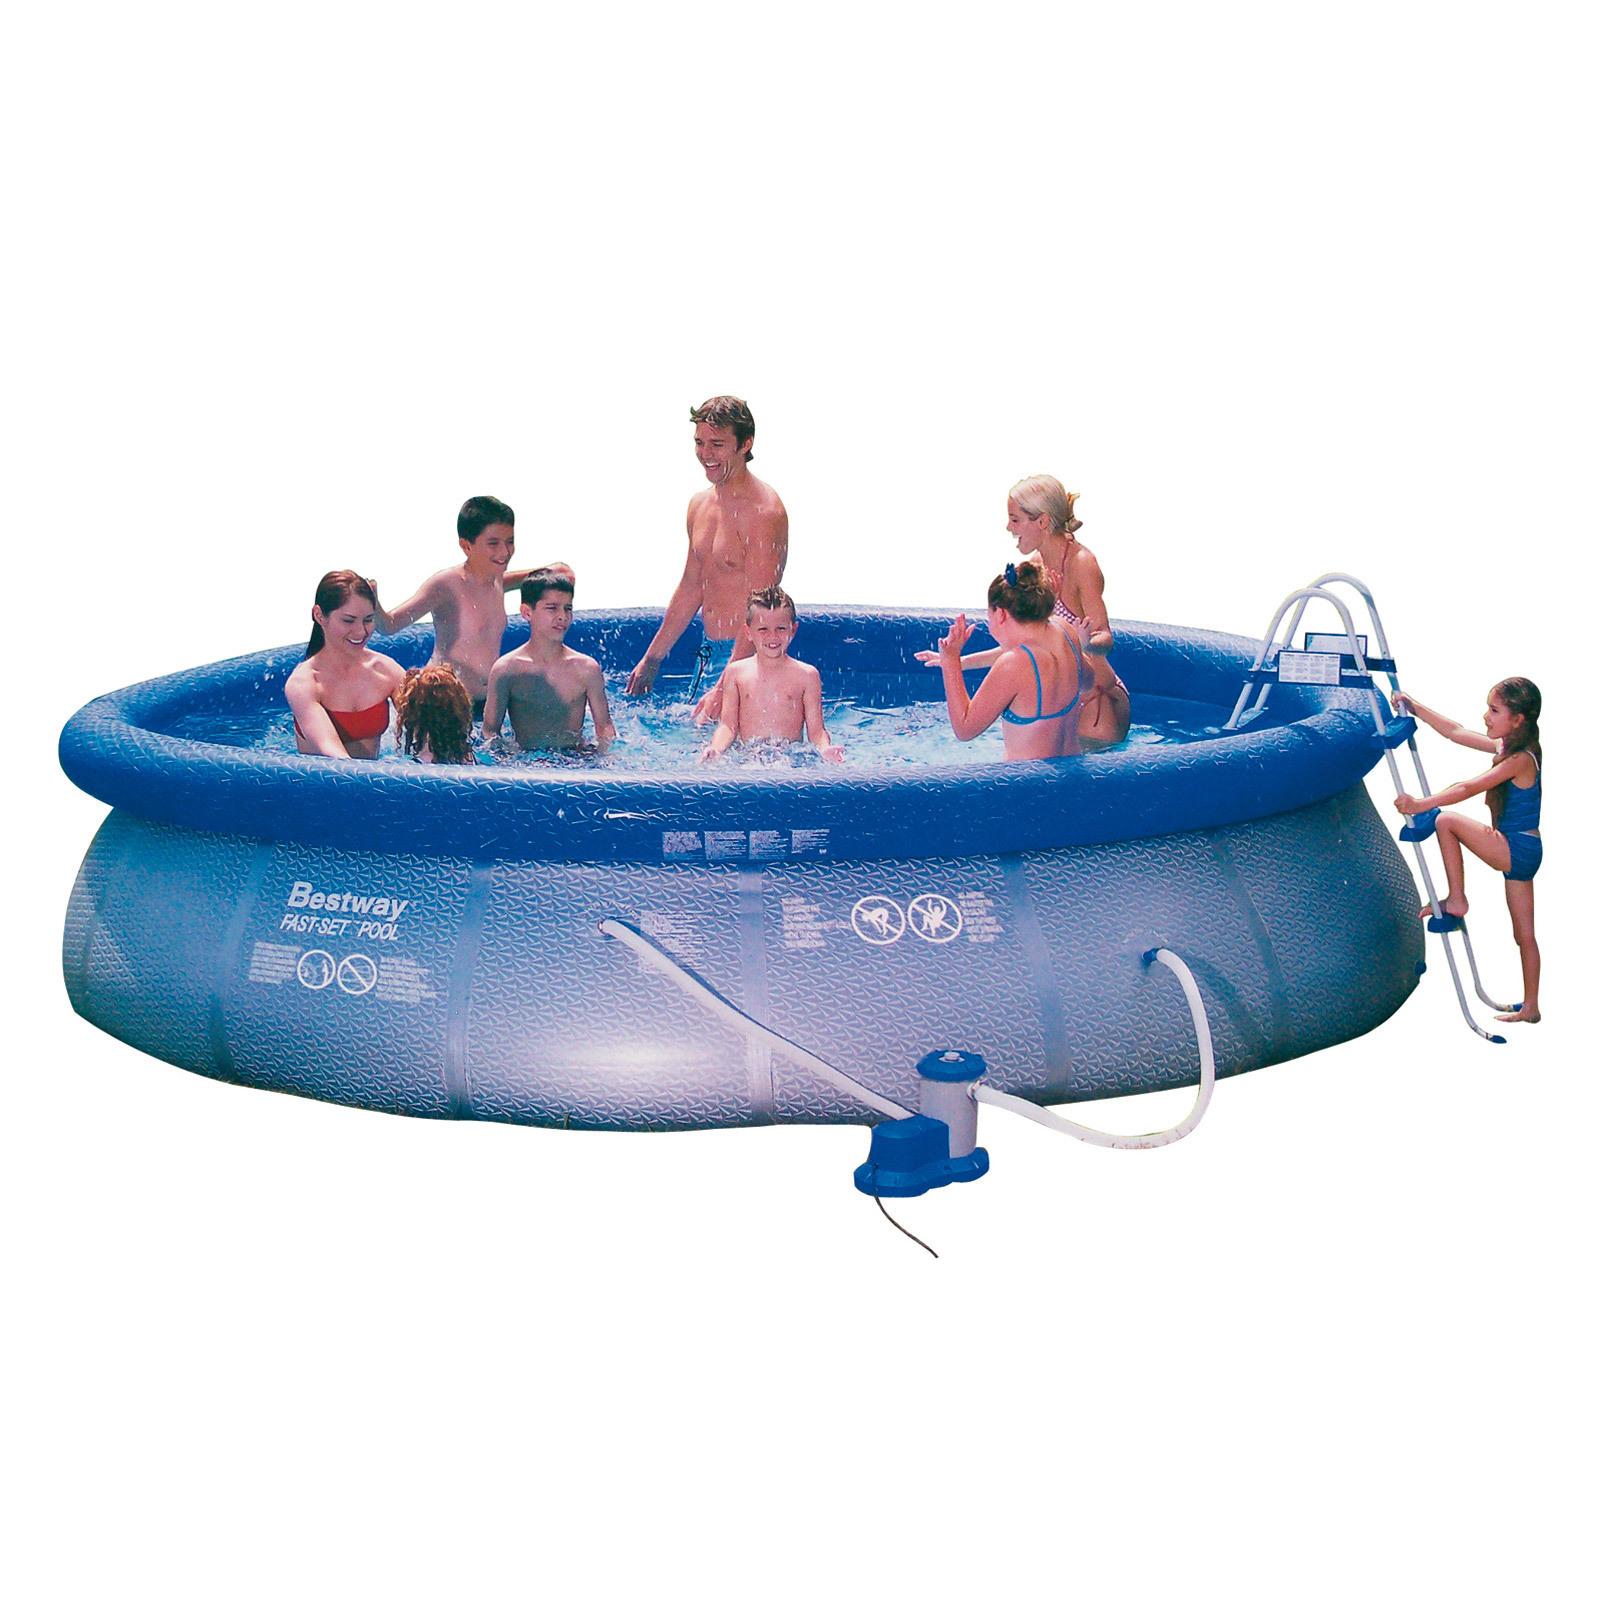 garten pool set komplett swimmingpool schwimmbad. Black Bedroom Furniture Sets. Home Design Ideas